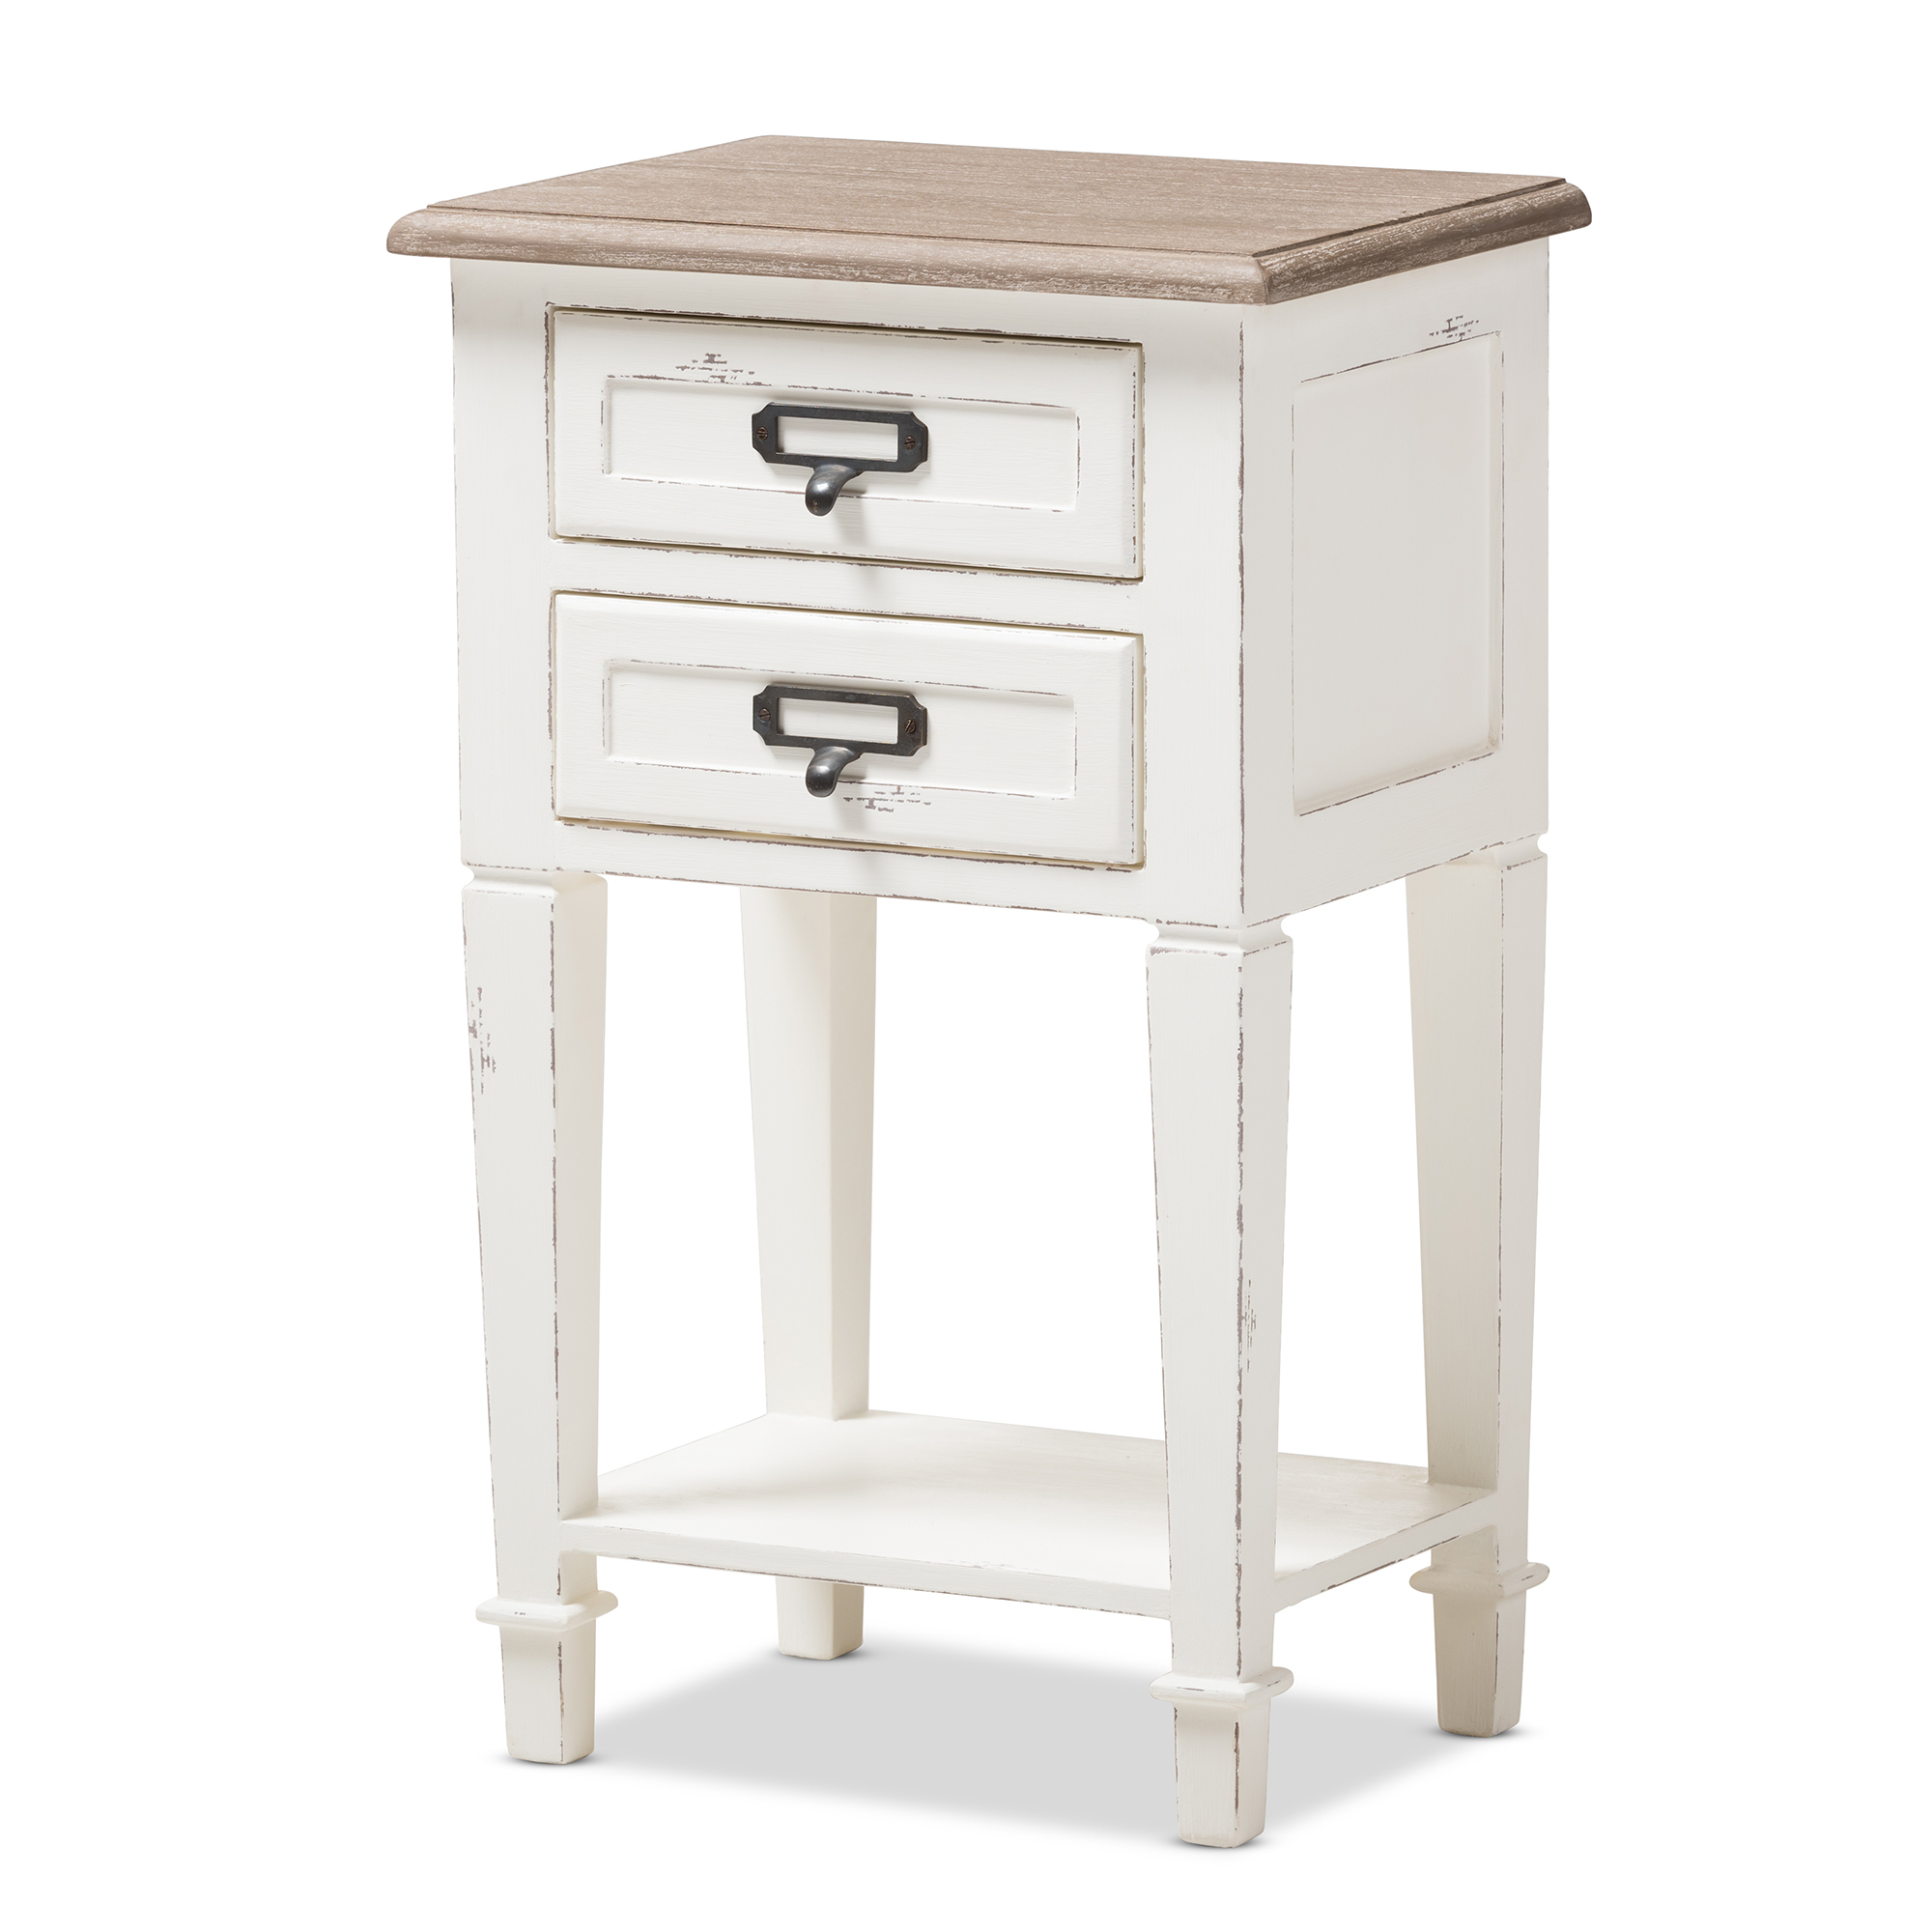 bed distressed bedroom top weathered frames res dresser pic granite design wood white hi the furniture wallpaper pages